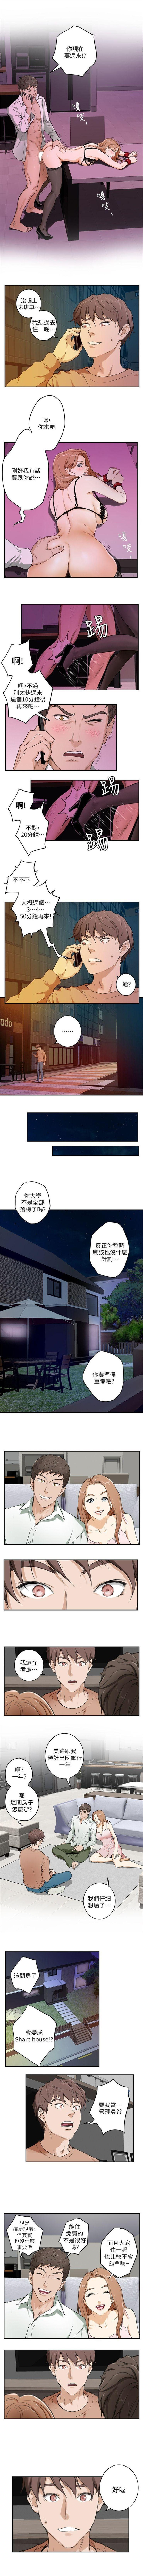 S-Mate 1-10 中文翻译(更新中) 5